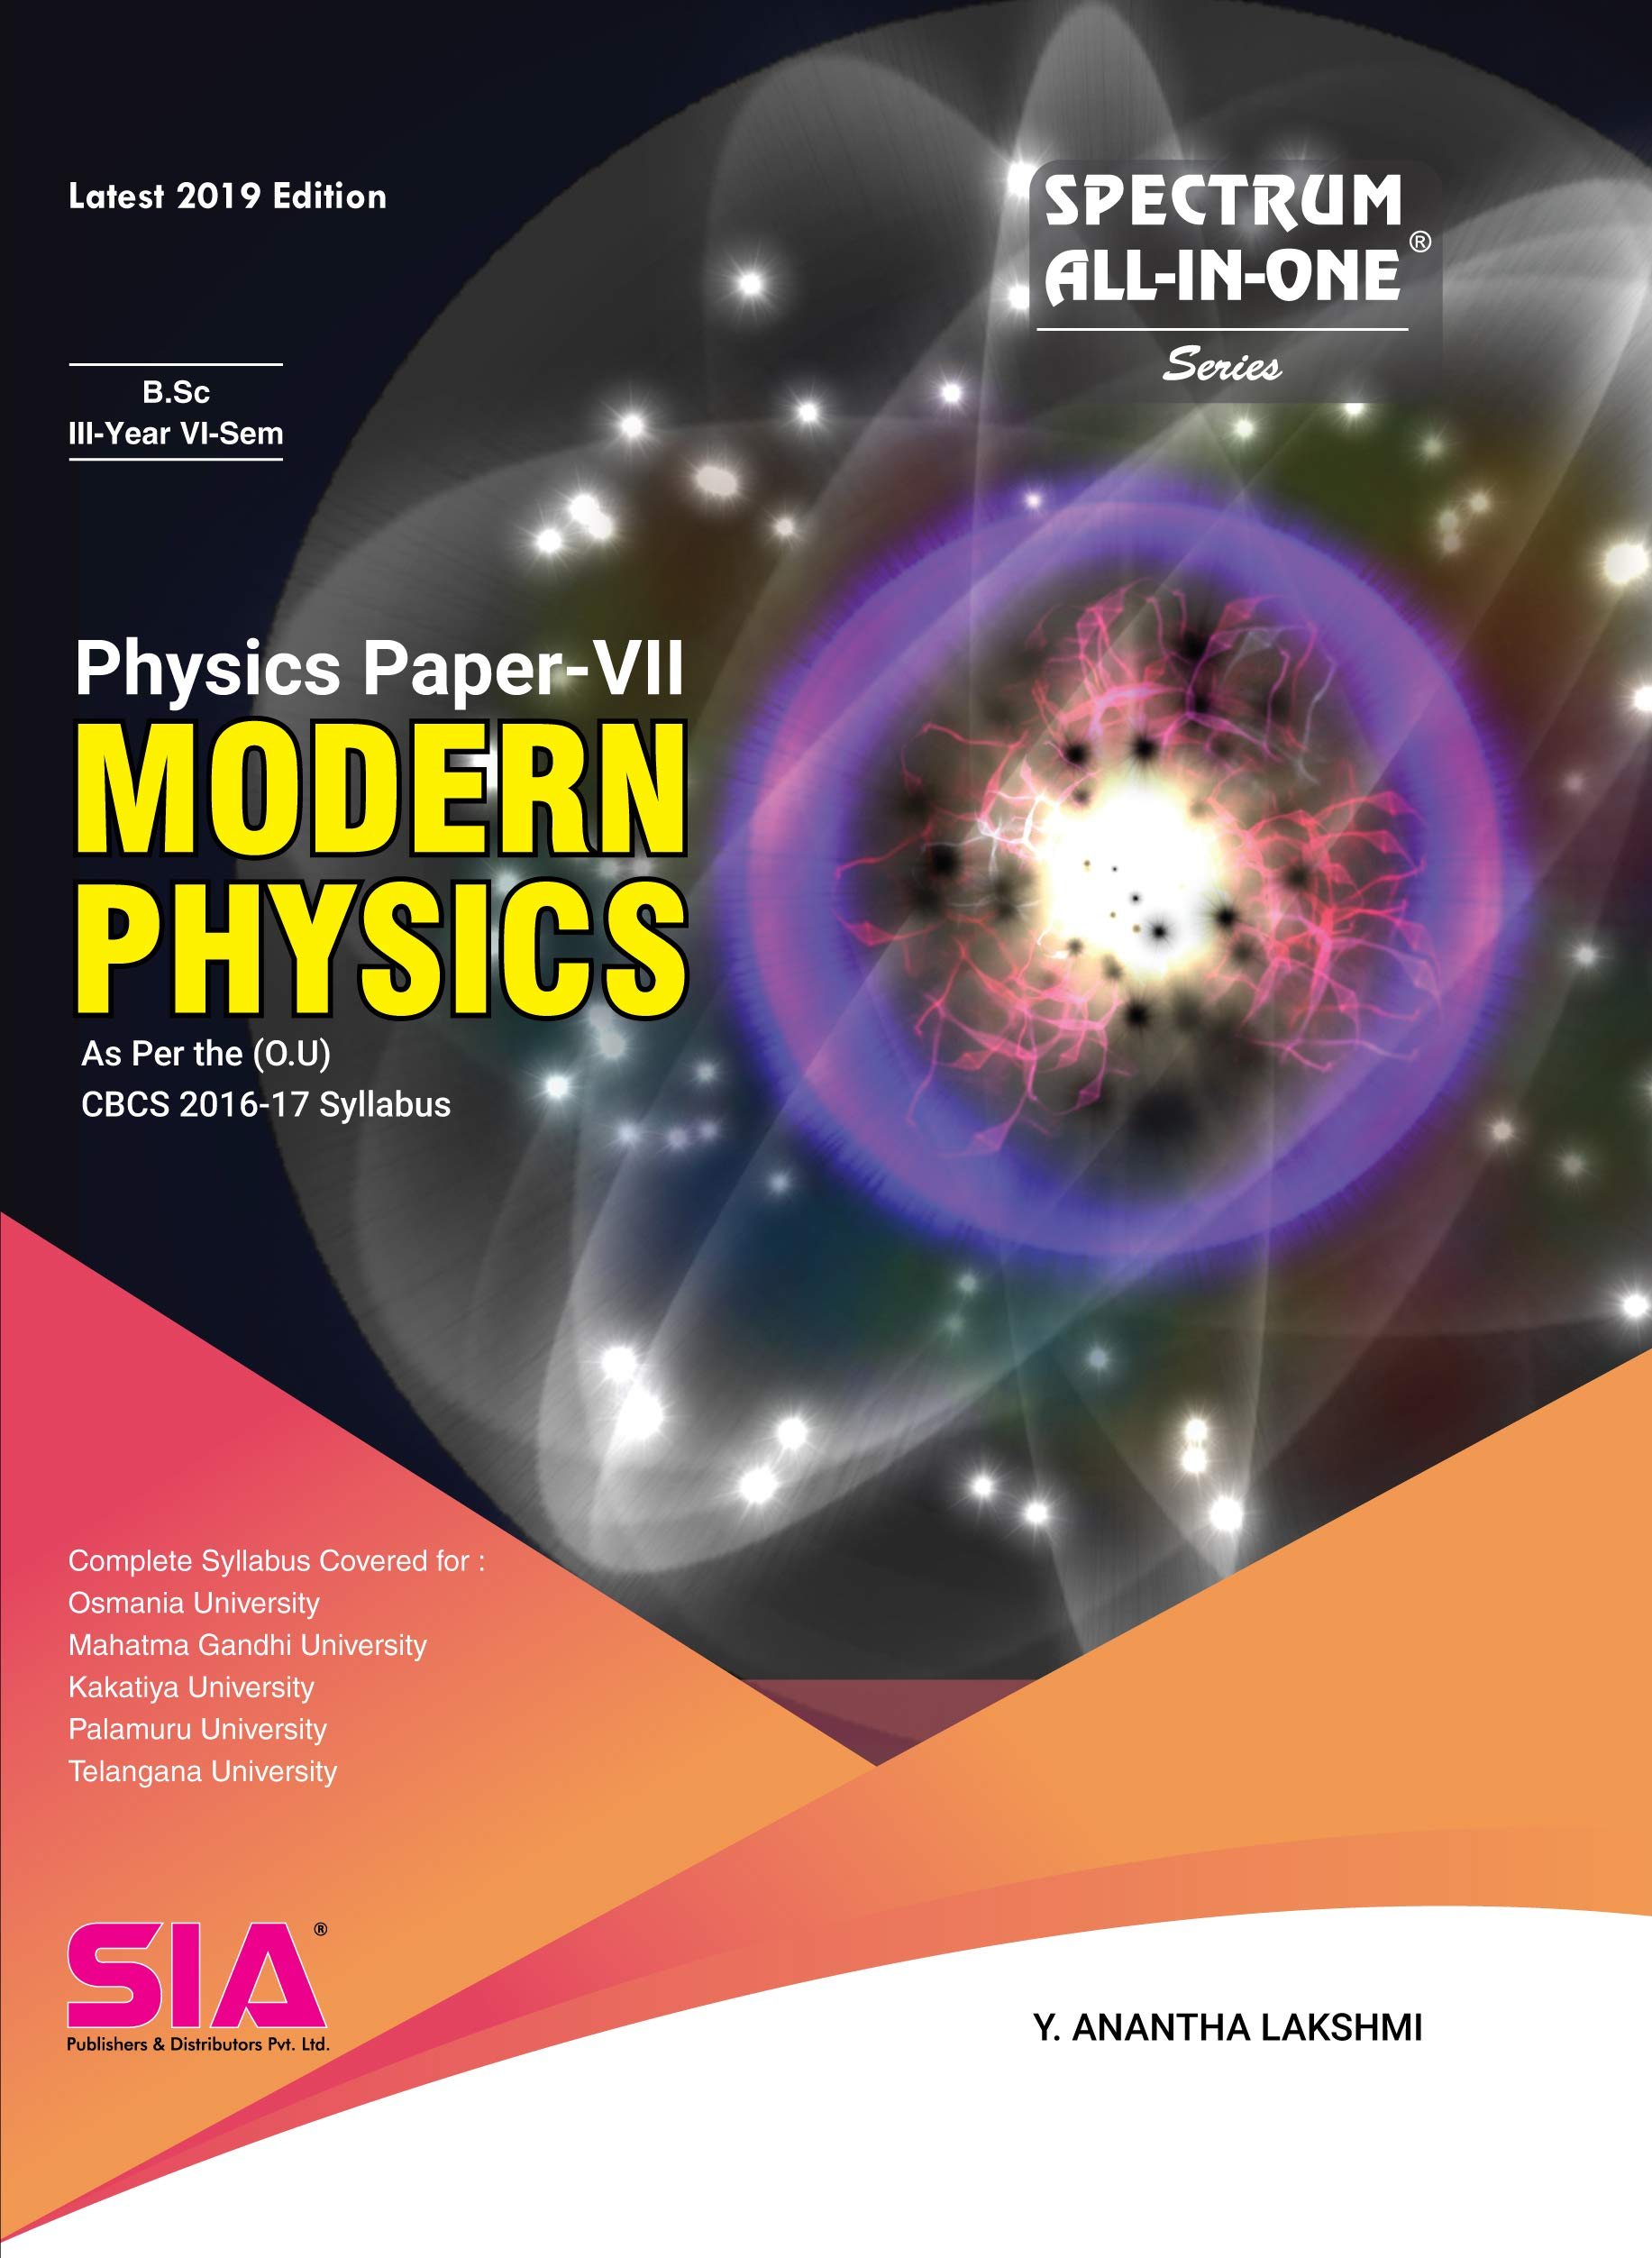 SIA Publishers arts-and-science-bsc-kakatiya-university-IIIyear-VIsem